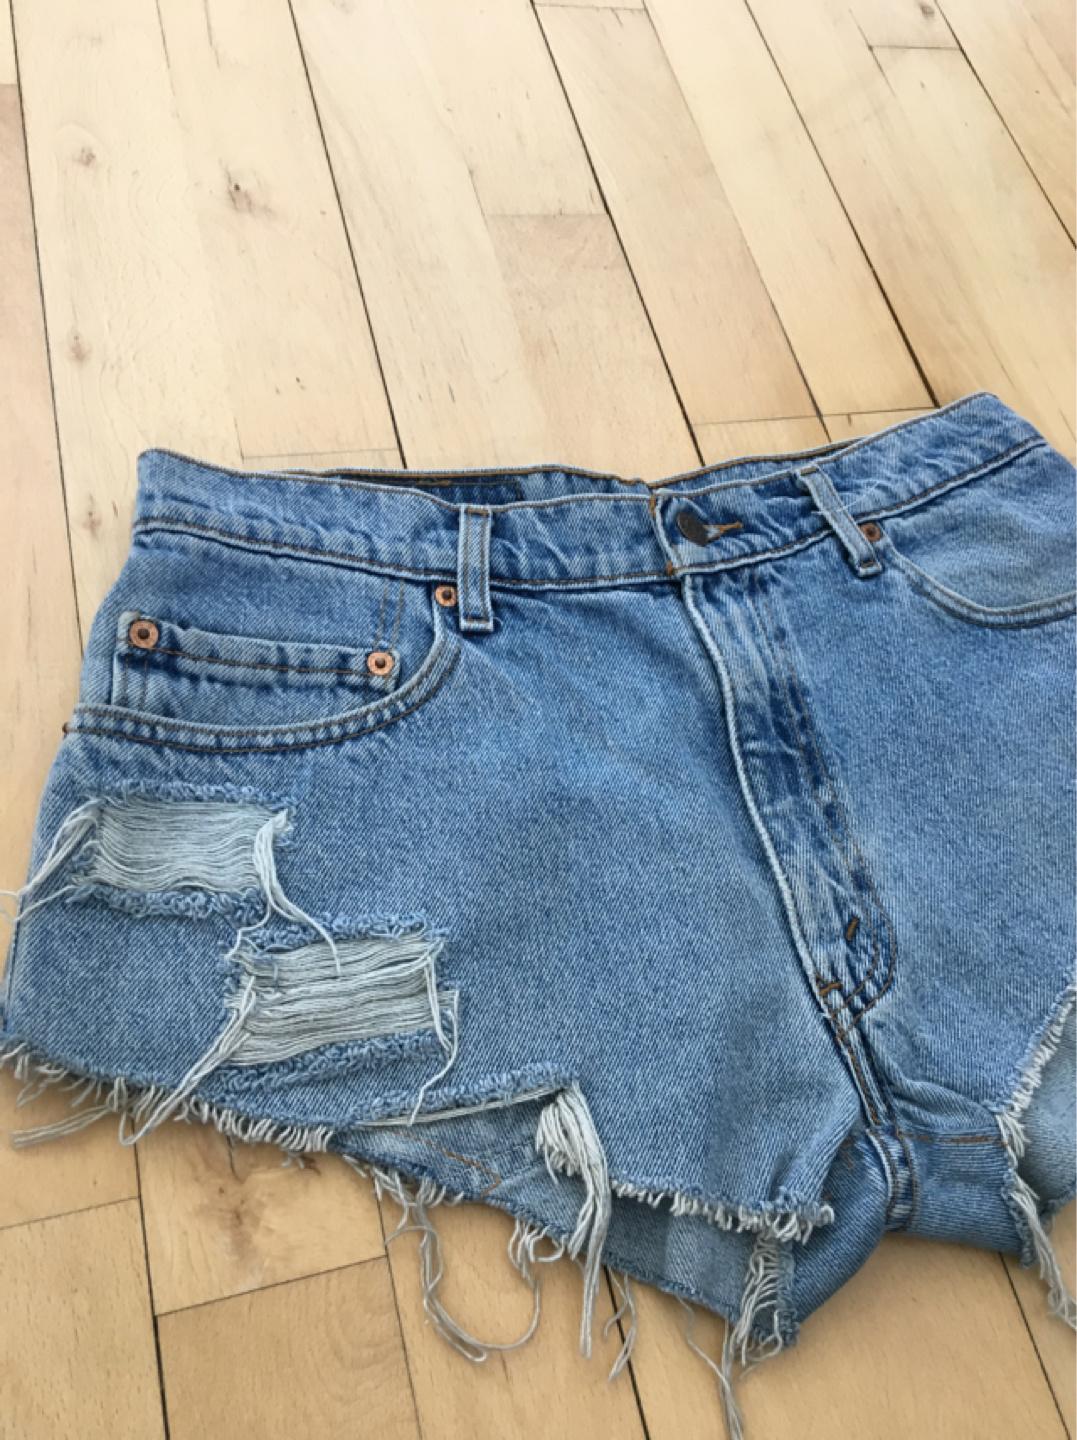 Women's shorts - LEVI'S photo 3